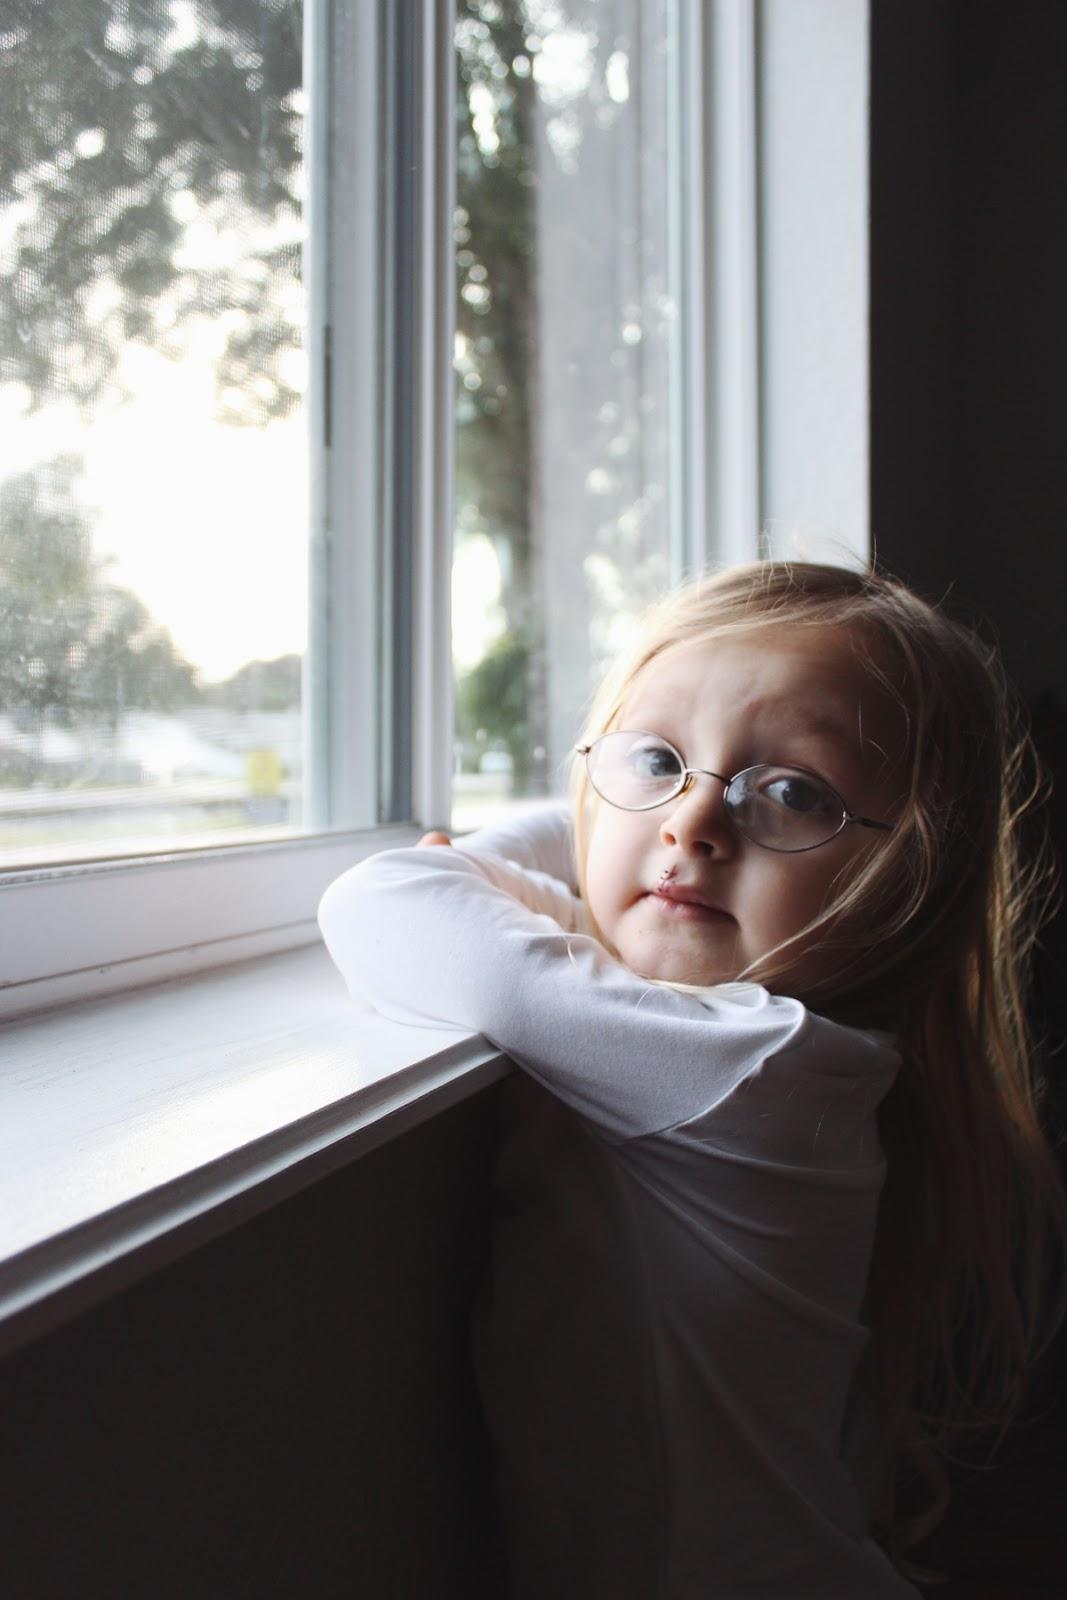 Looking Away From Window